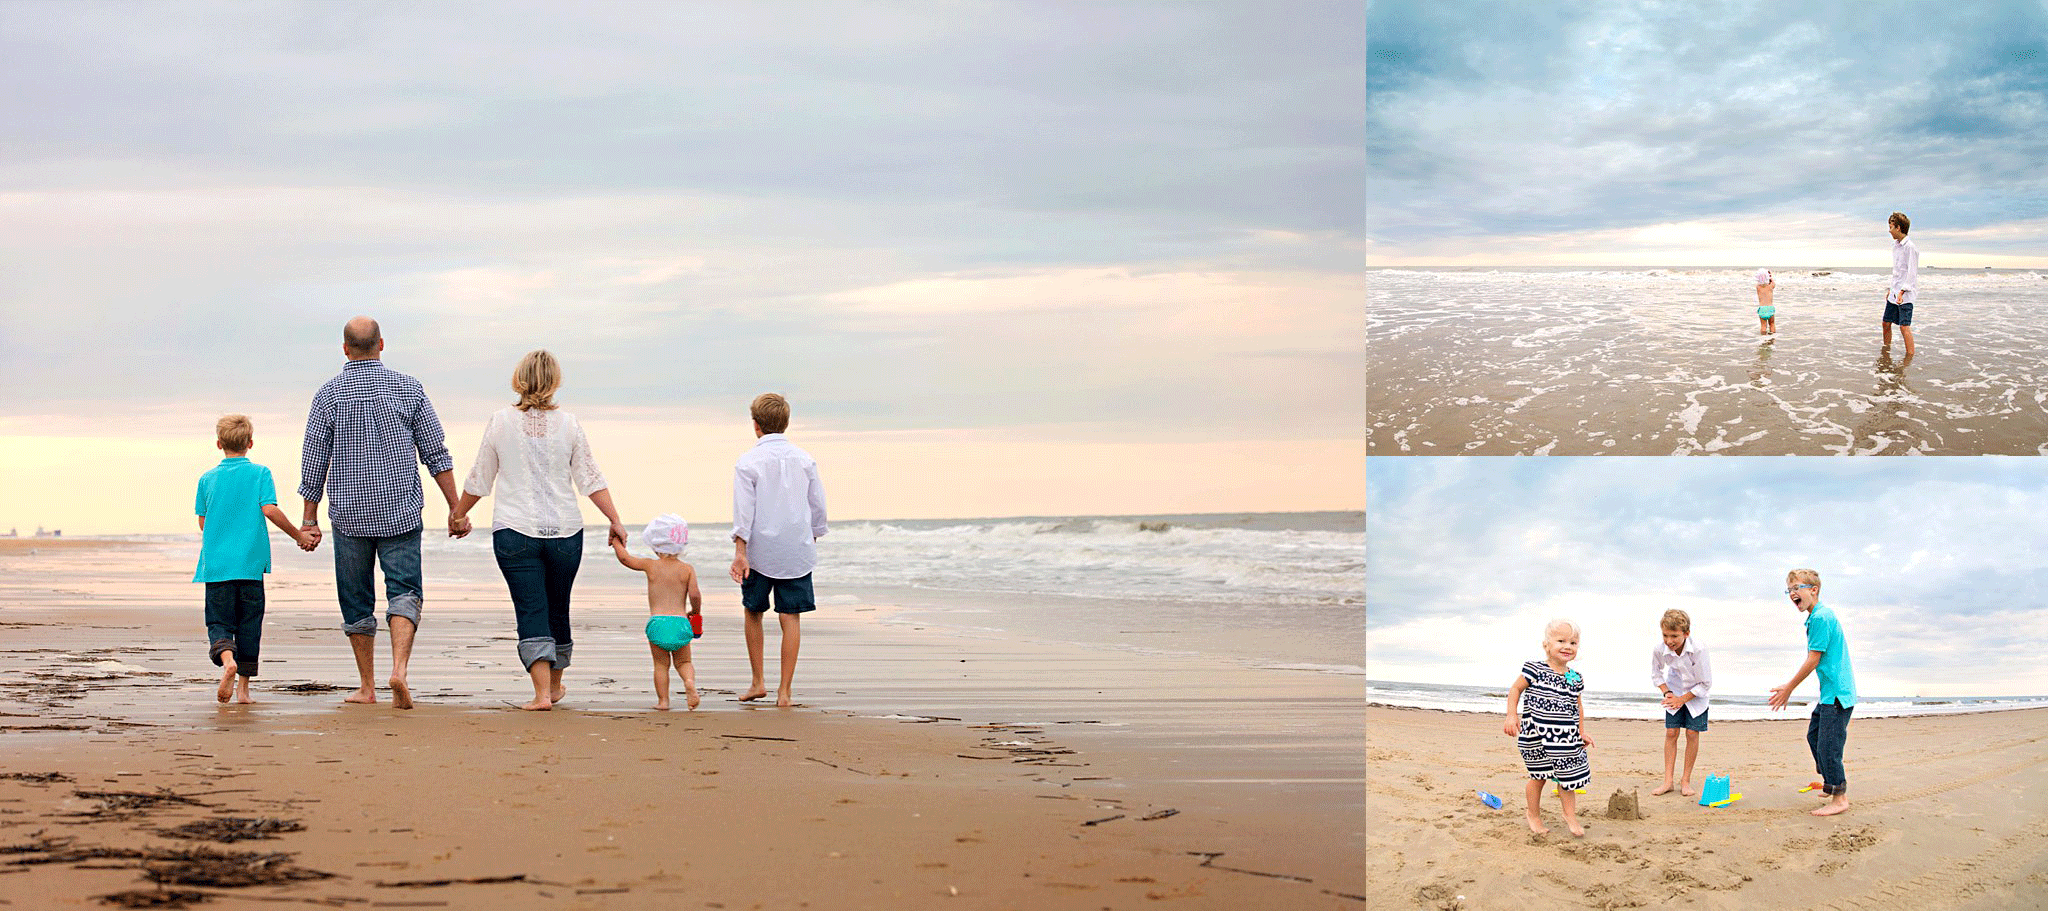 sandbridge-beach-photography-family-photographers-virginia-beach-norfolk-chesapeake-melissa-bliss-photography.png